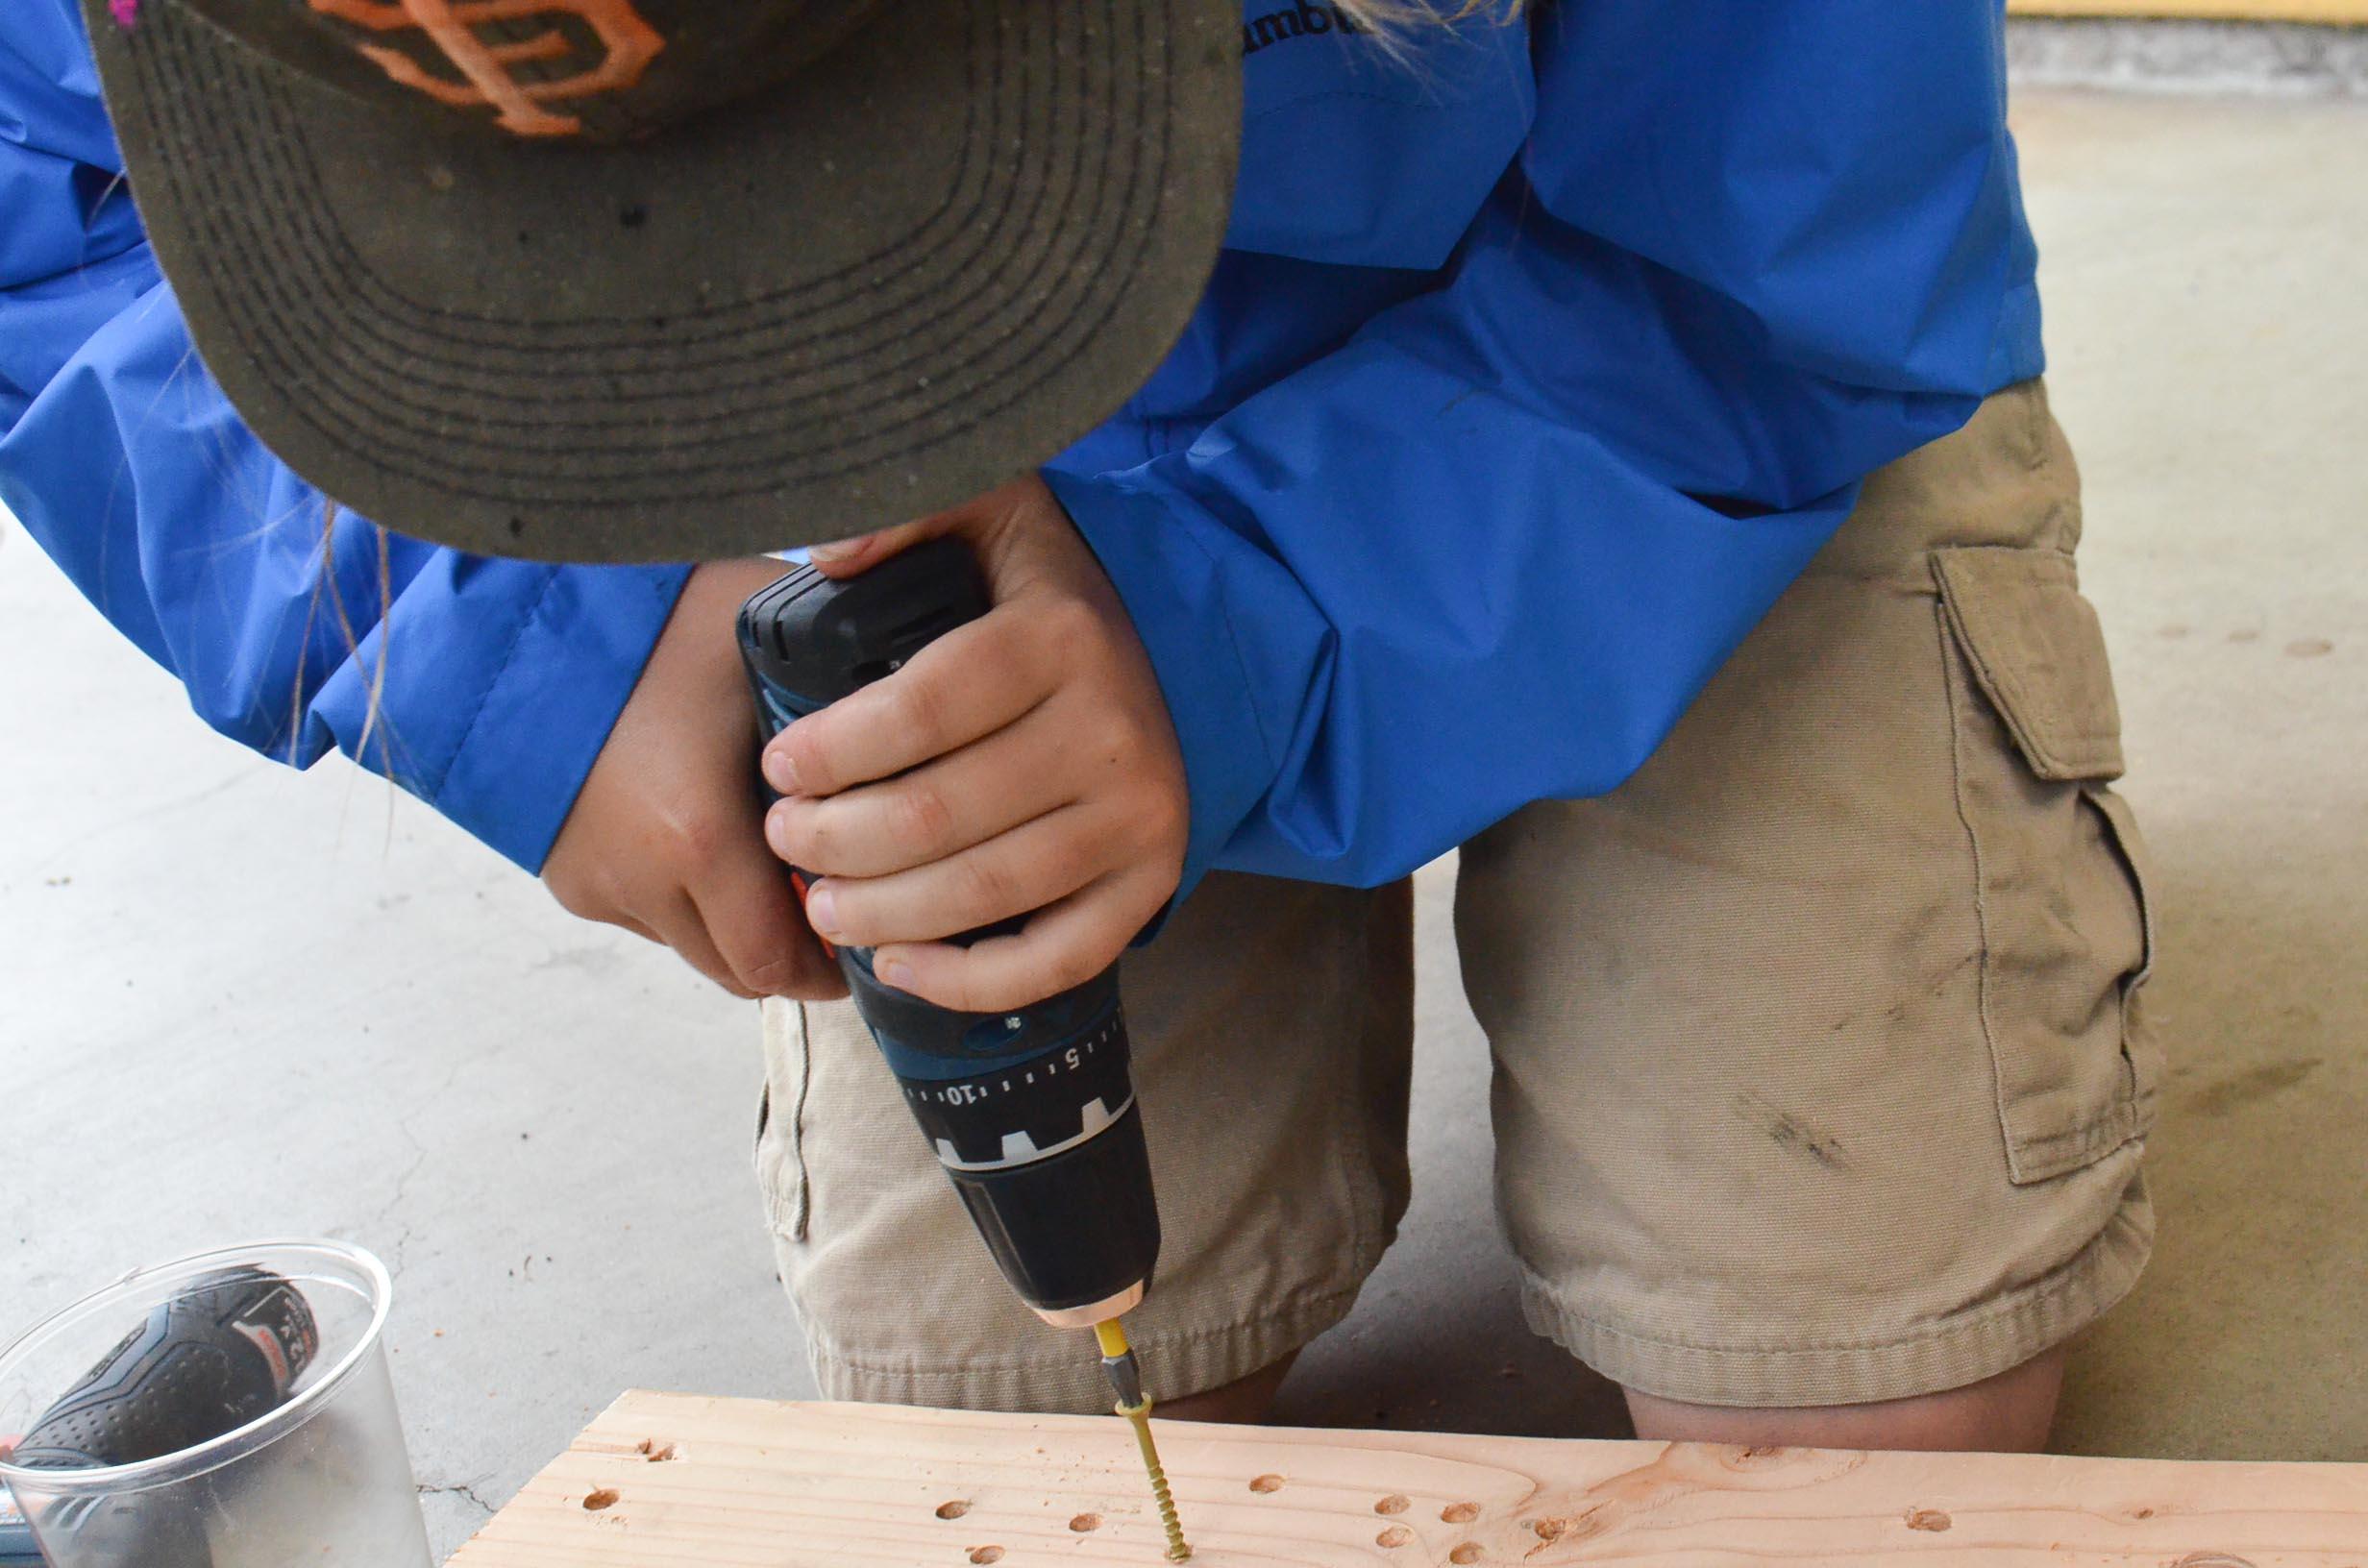 Aiden practices driving lots of screws.